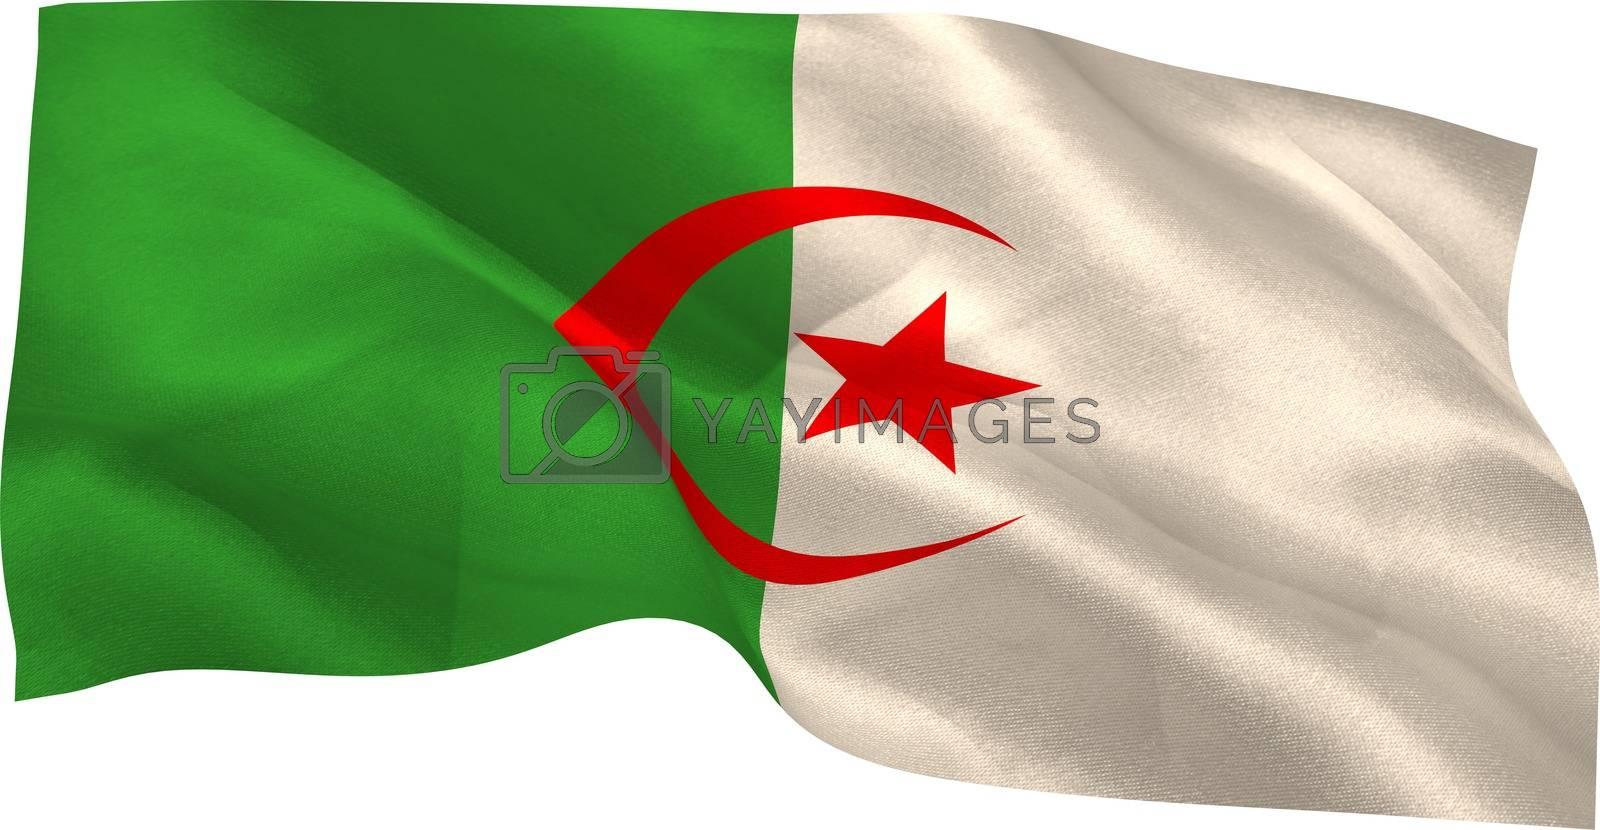 Royalty free image of Digitally generated algeria national flag by Wavebreakmedia